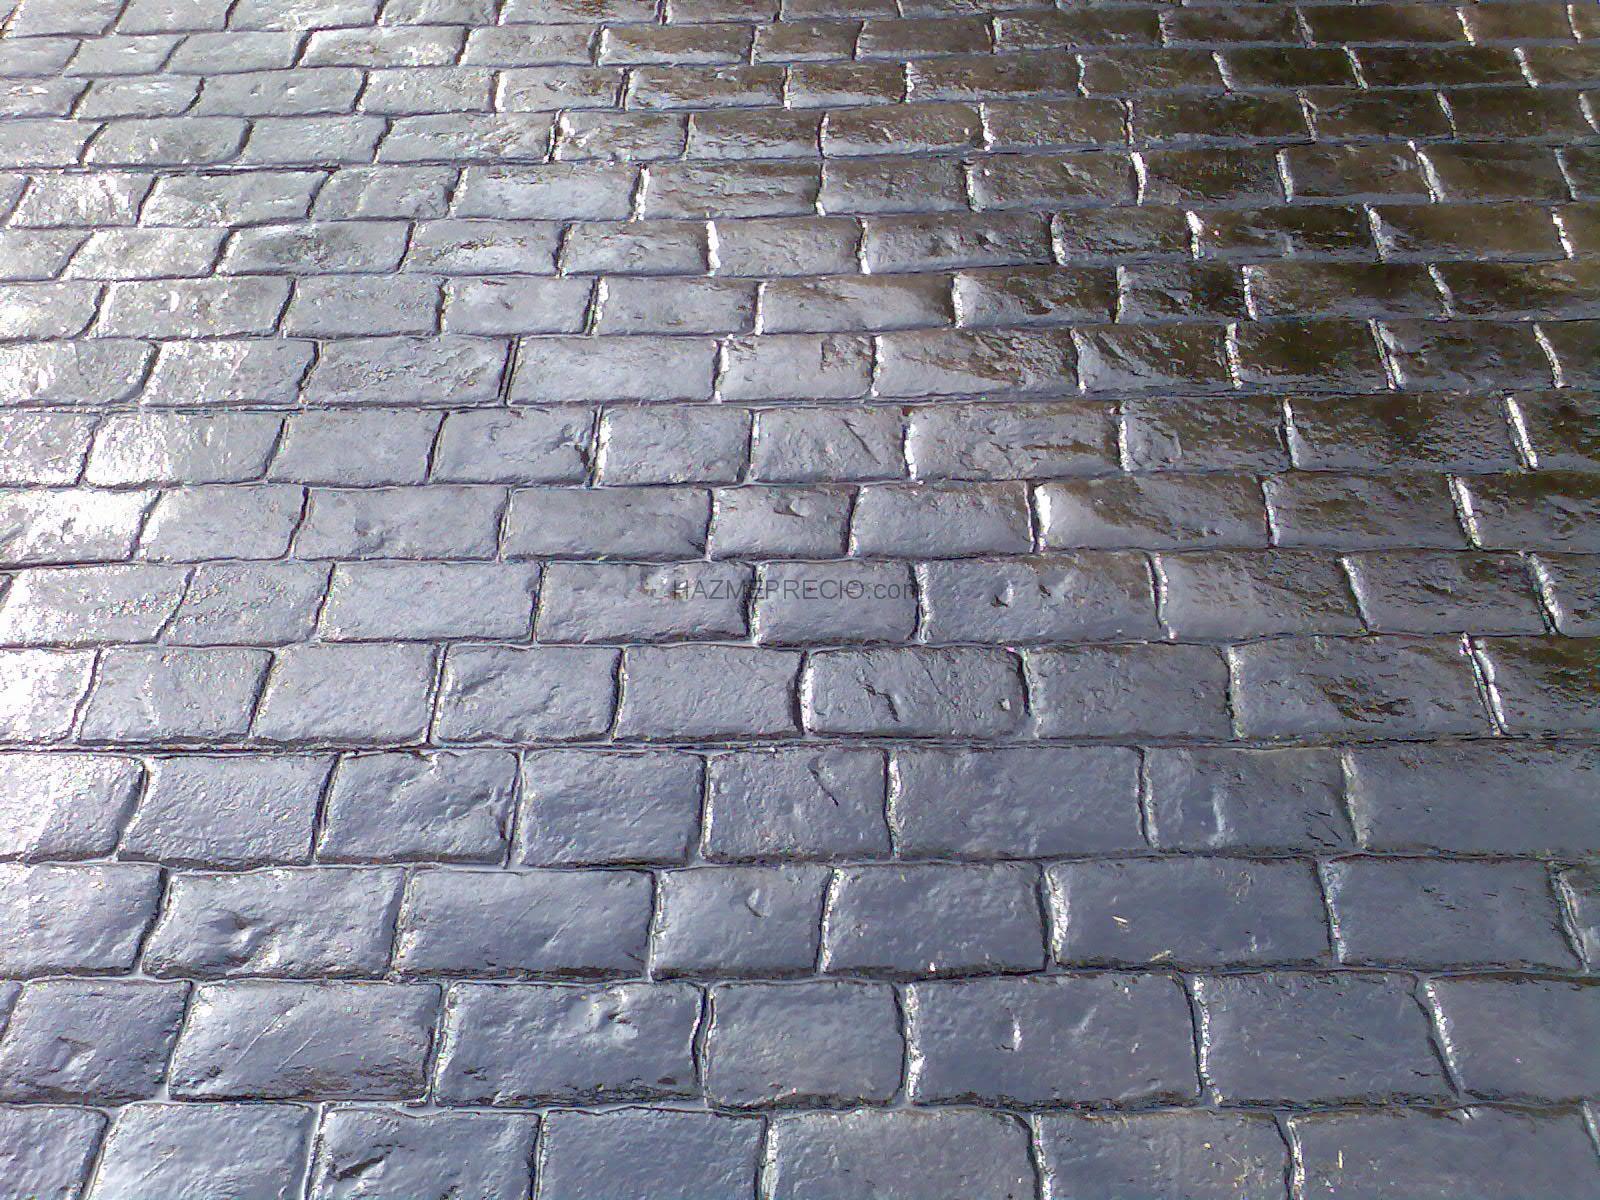 Pavimento Impreso Lucar Sl 43007 Tarragona Tarragona